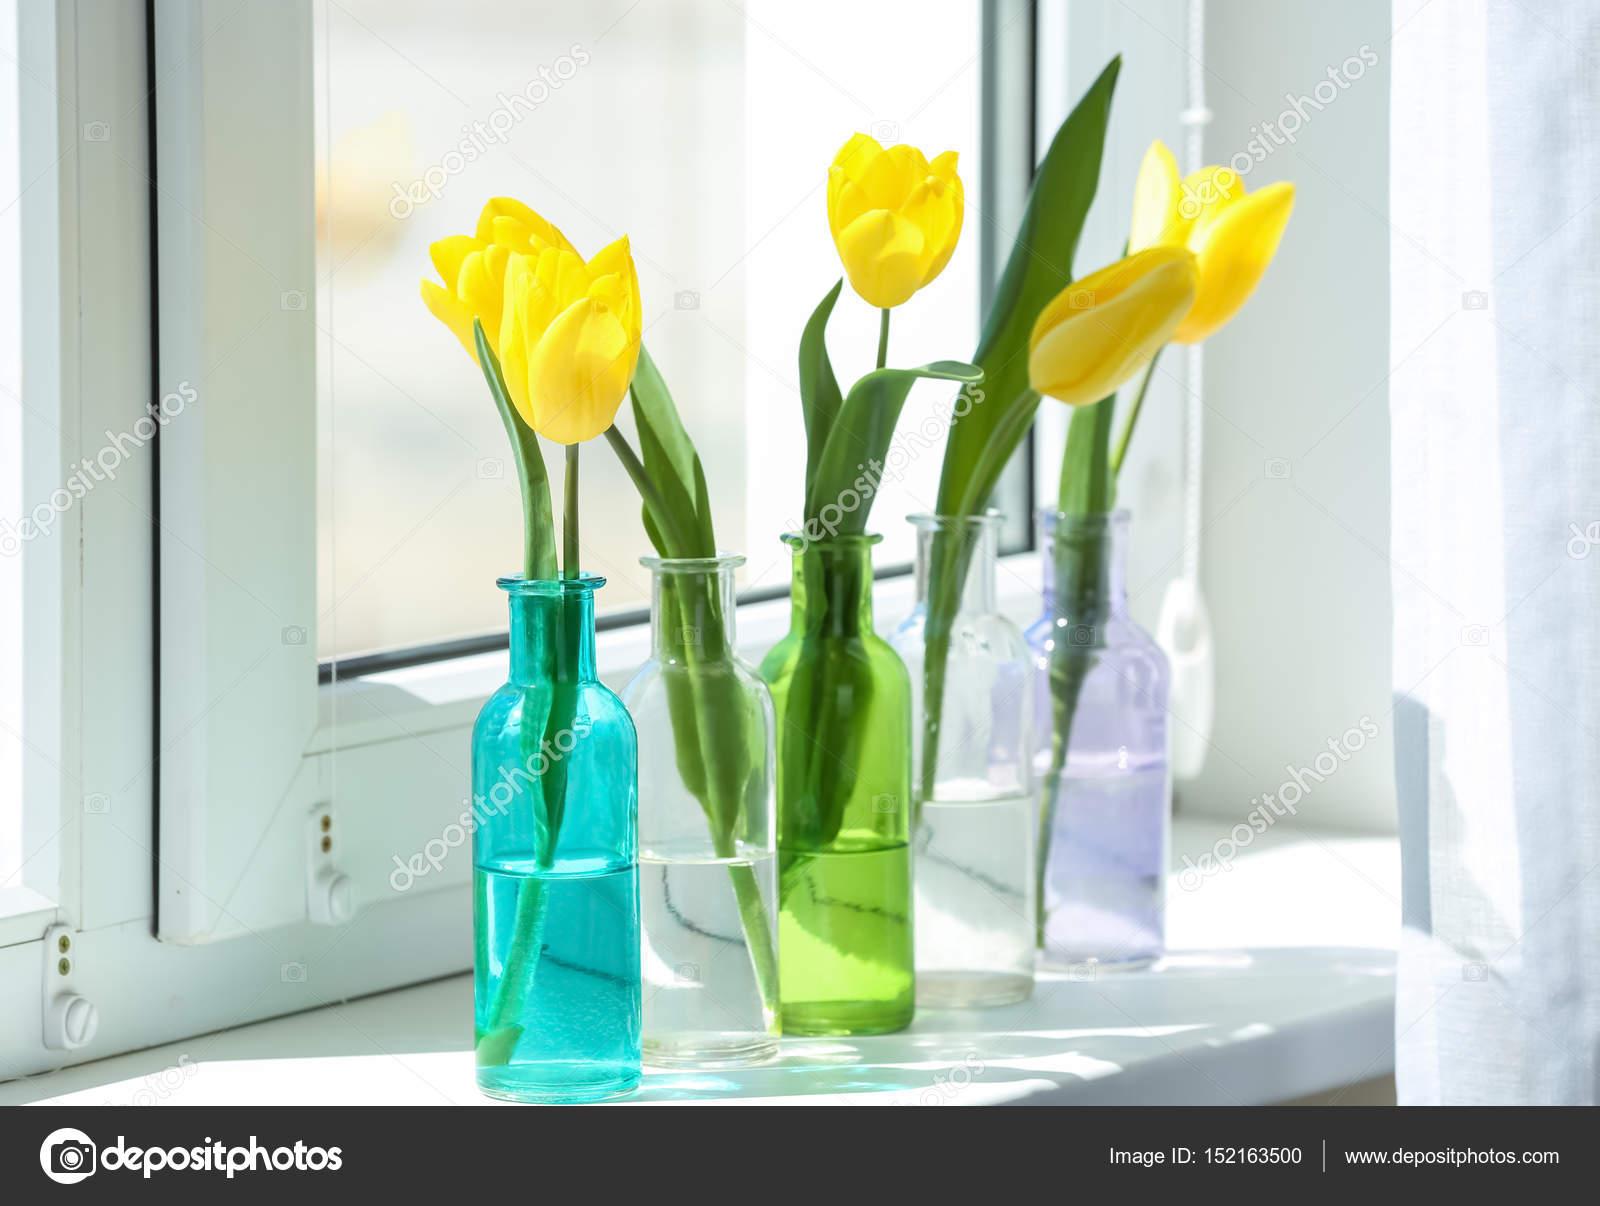 Vasi con bei tulipani u2014 foto stock © belchonock #152163500